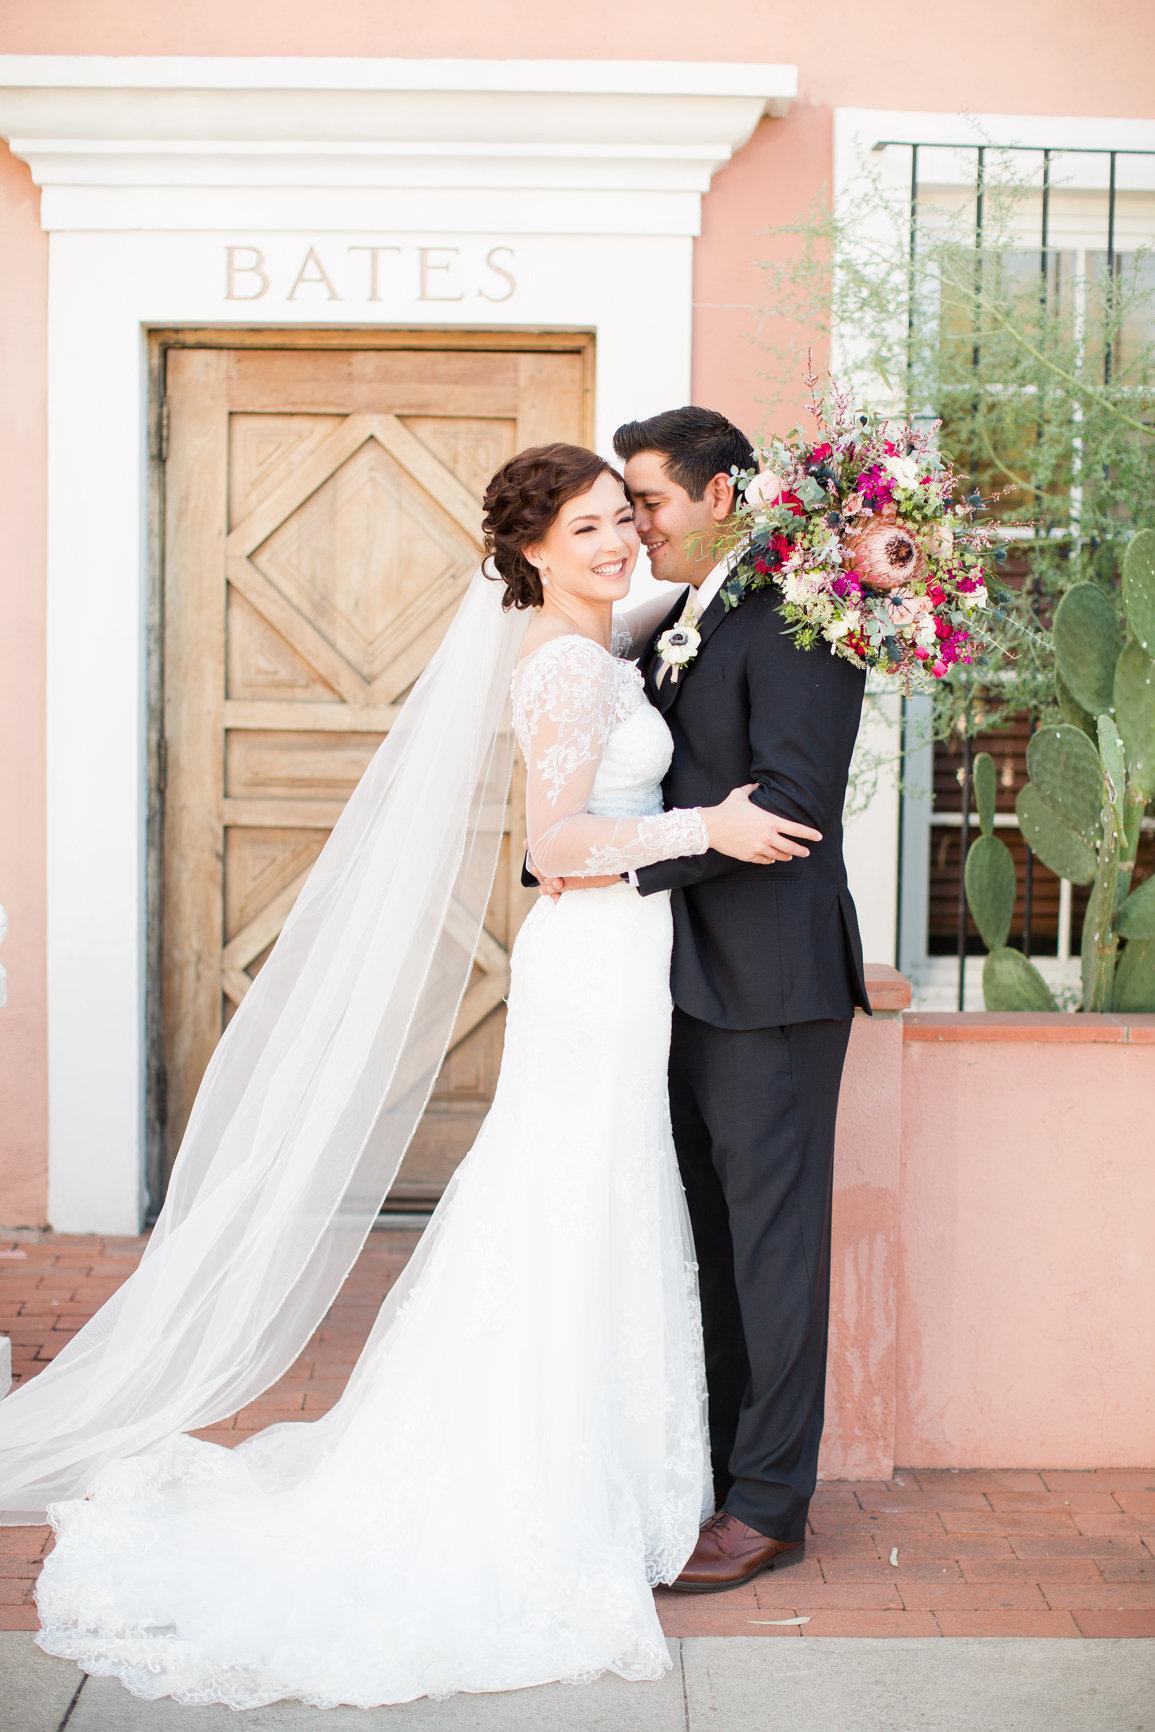 Jessica and Tannis Wedding-P C s Favorites-0012.jpg